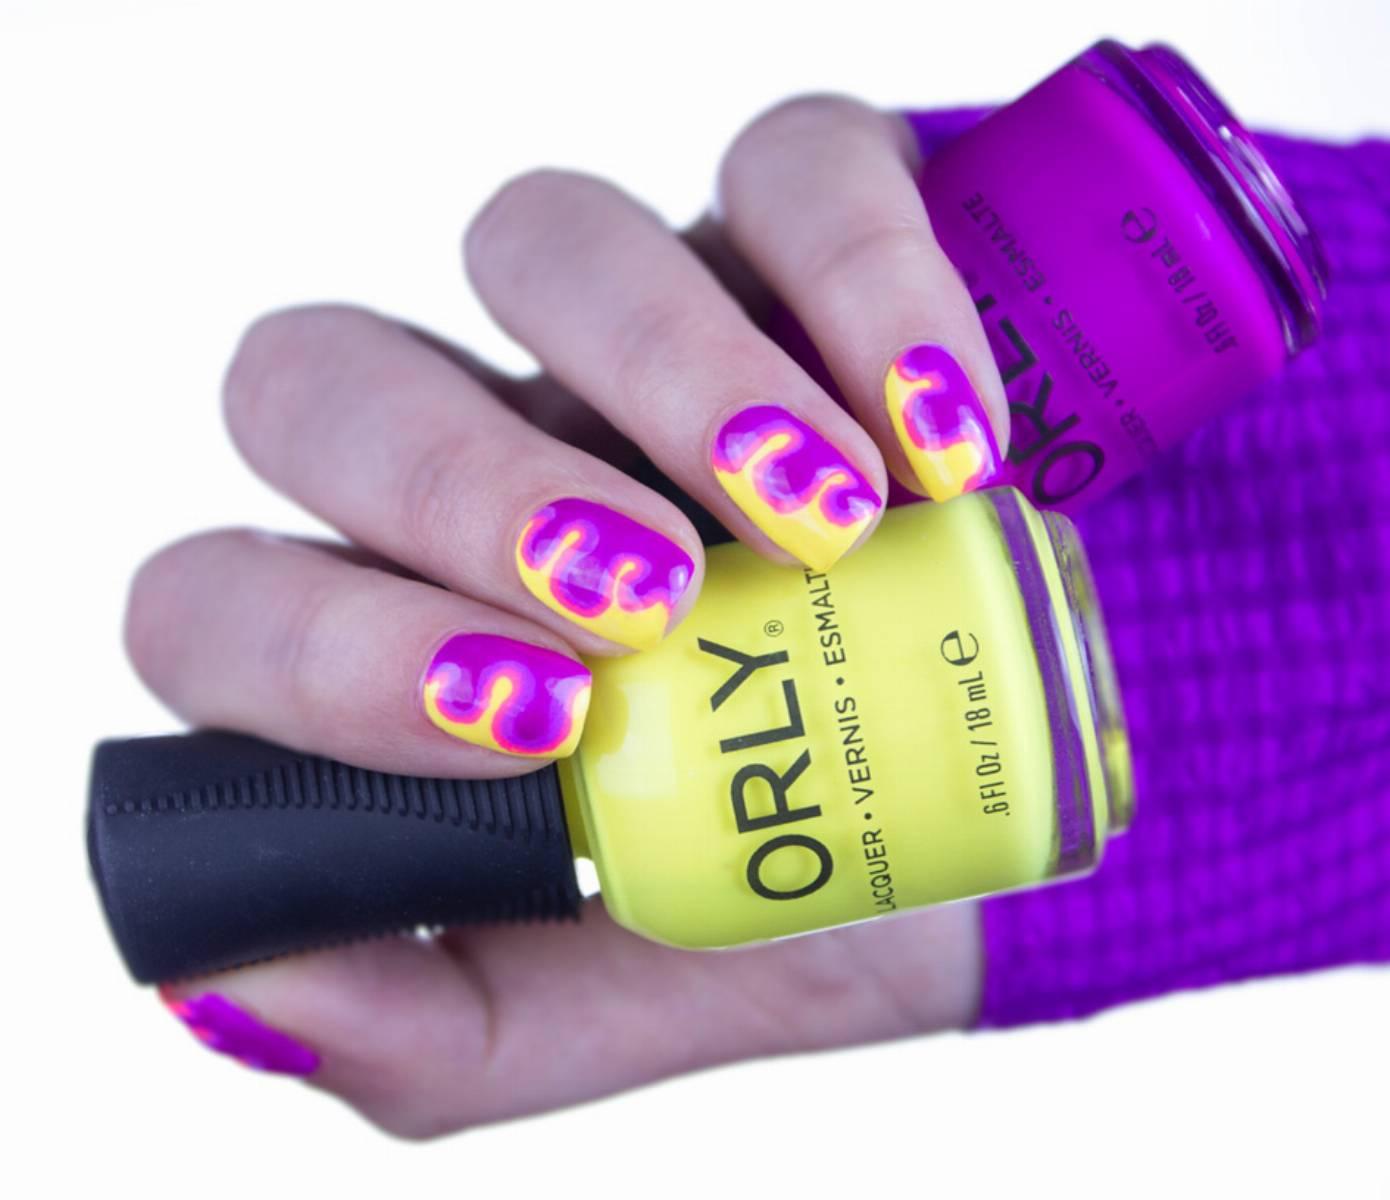 Modny Manicure Na Lato Neonowe Zdobienia Krok Po Kroku